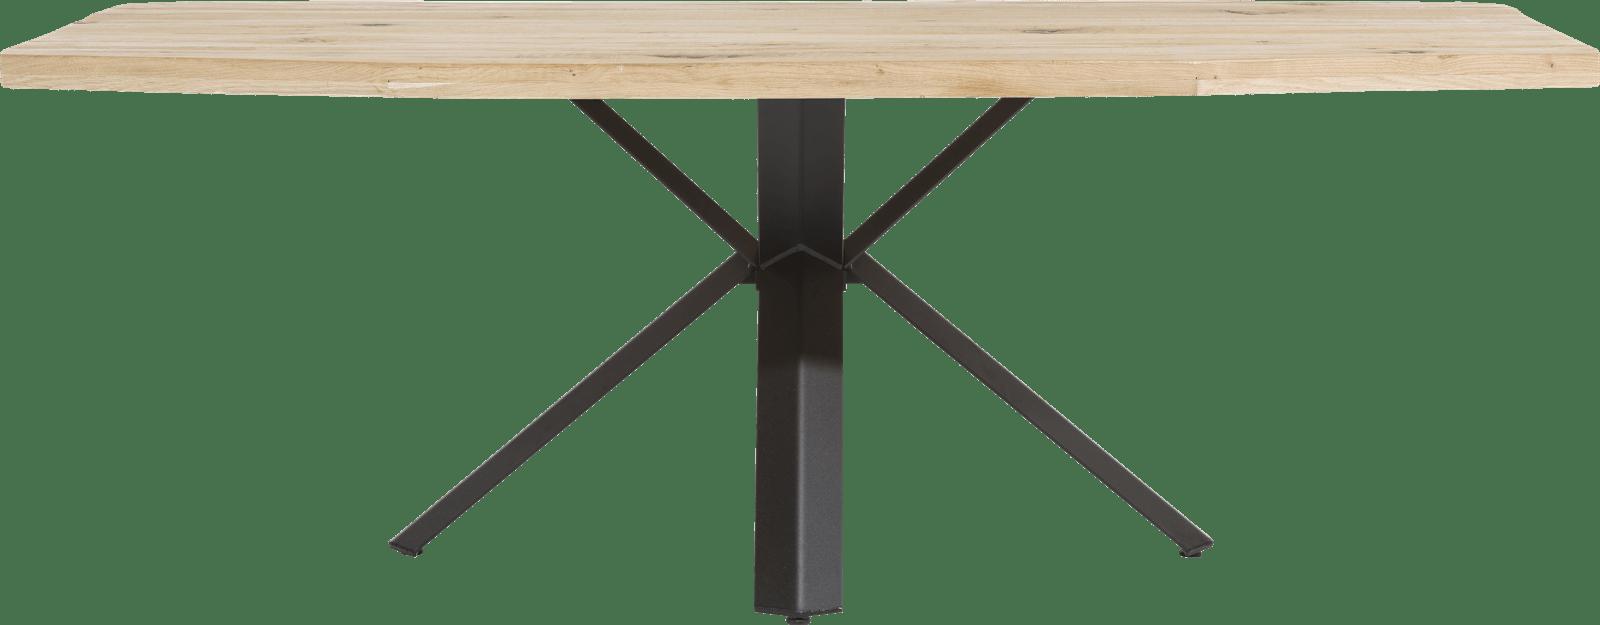 Maddox - table 220 x 100 cm - bois - pied forme etoile